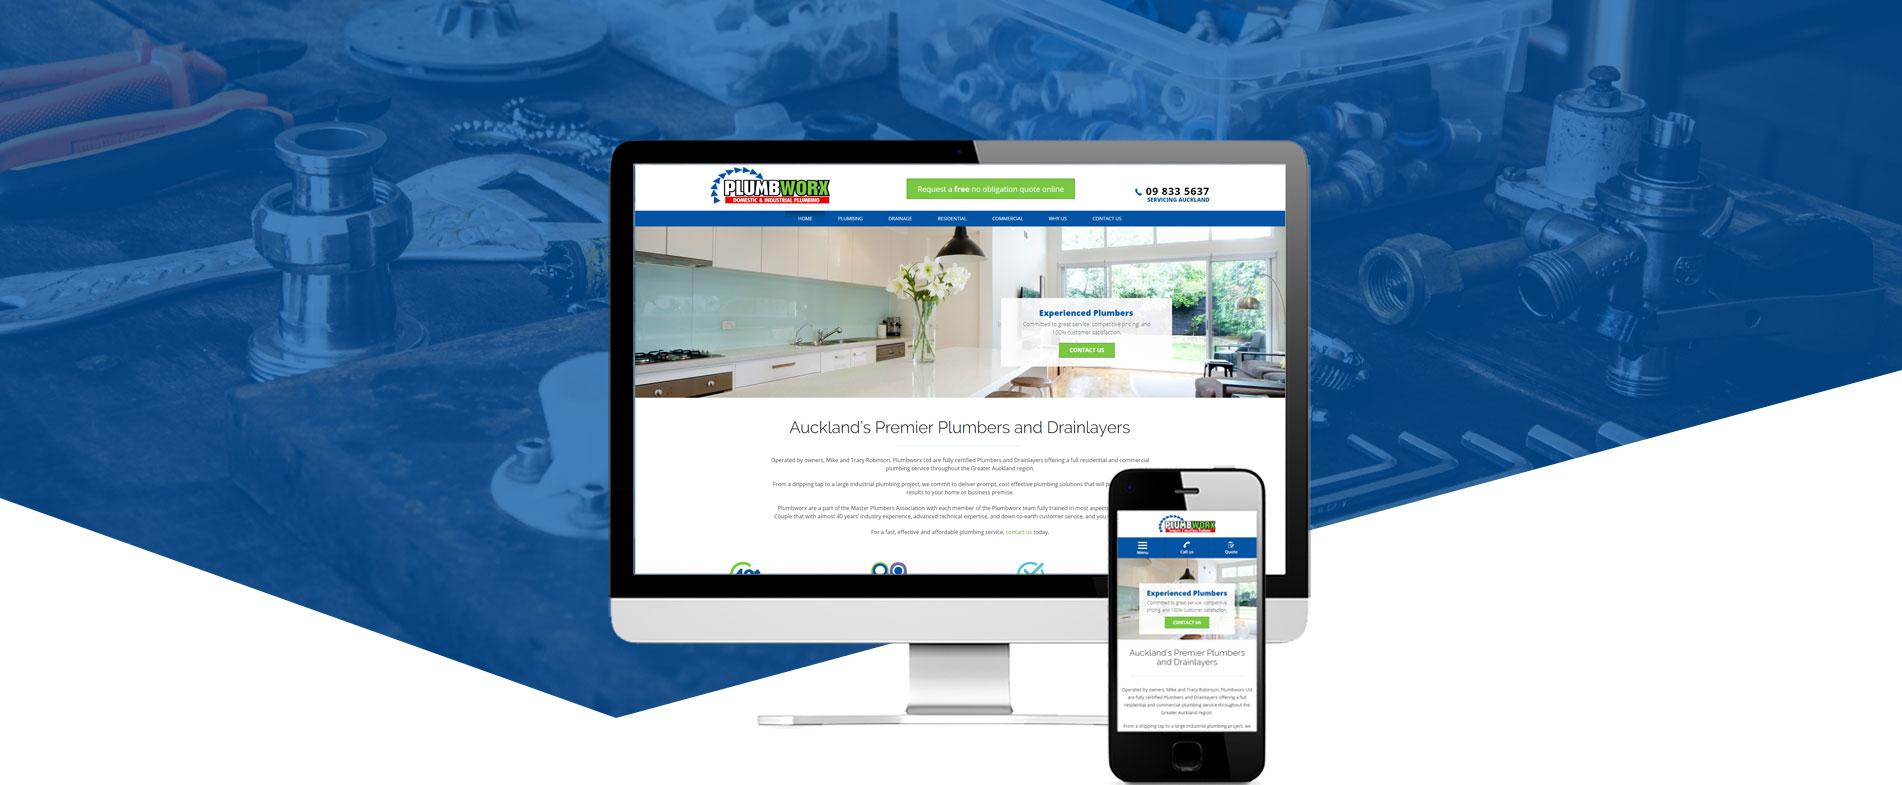 Plumbworx website design hero image - Plumbworx Website Design